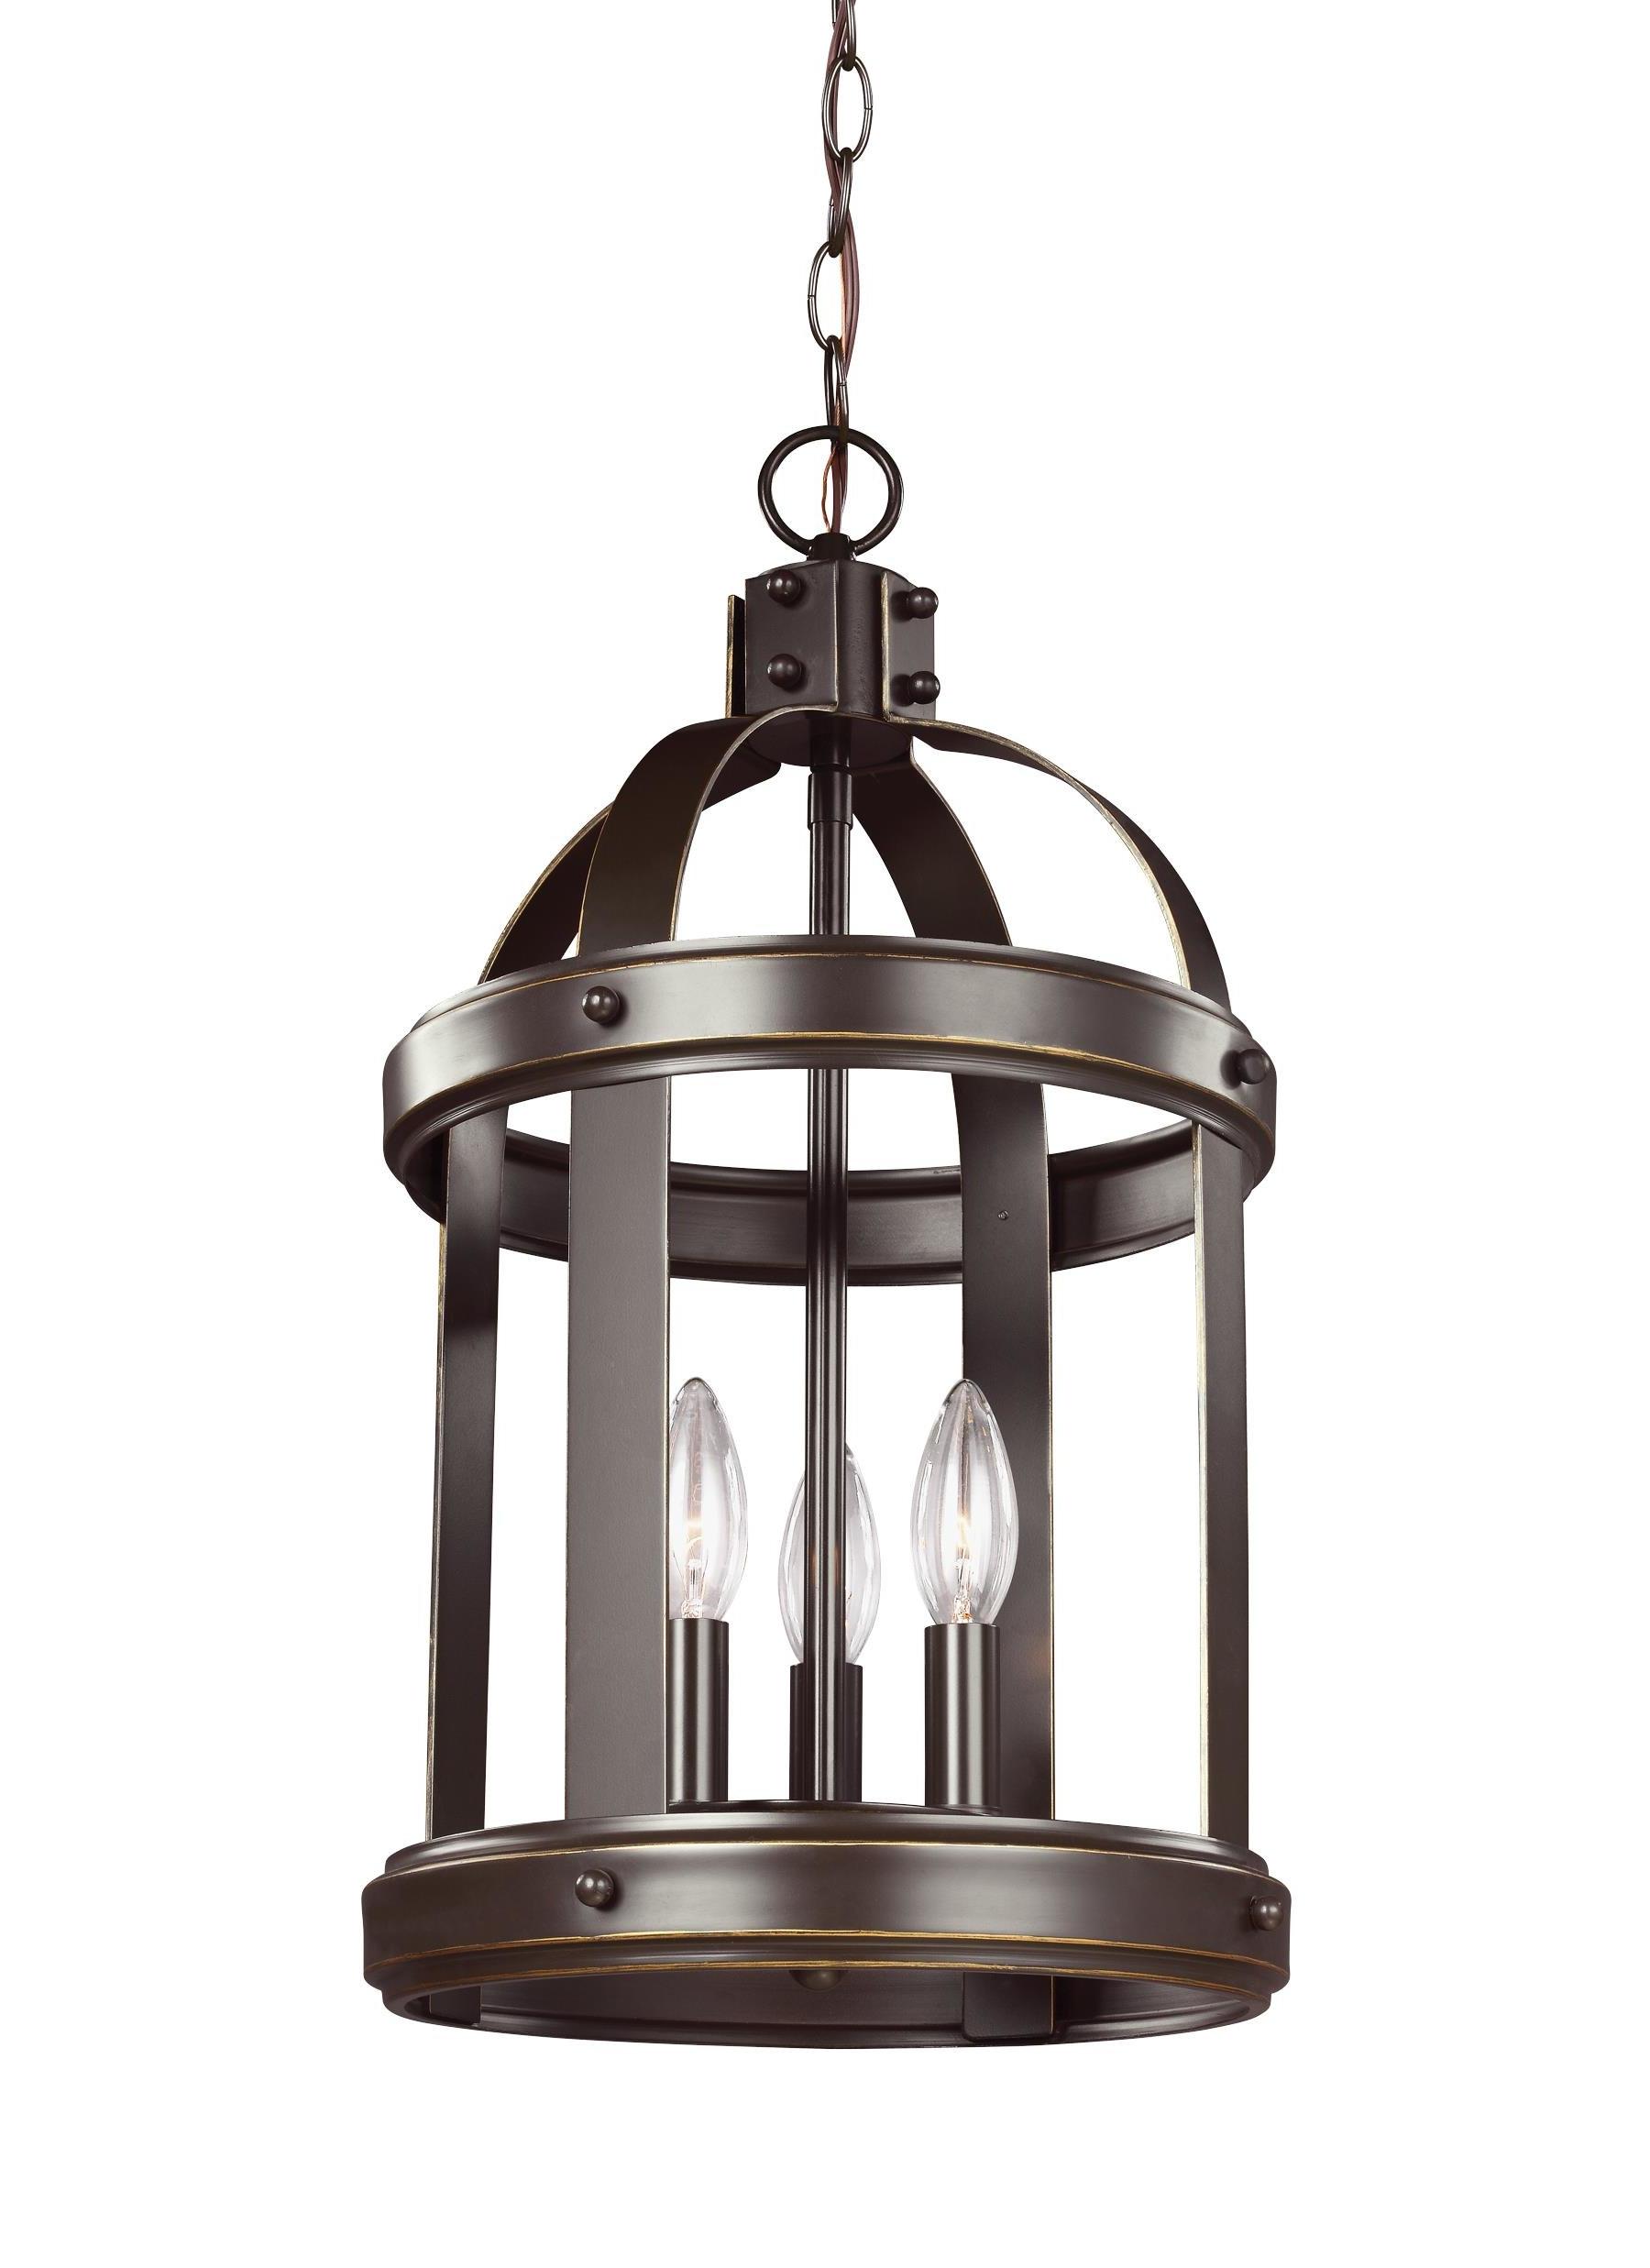 3 Light Lantern Cylinder Pendants Pertaining To Well Known Pawling 3 Light Lantern Cylinder Pendant (View 4 of 20)